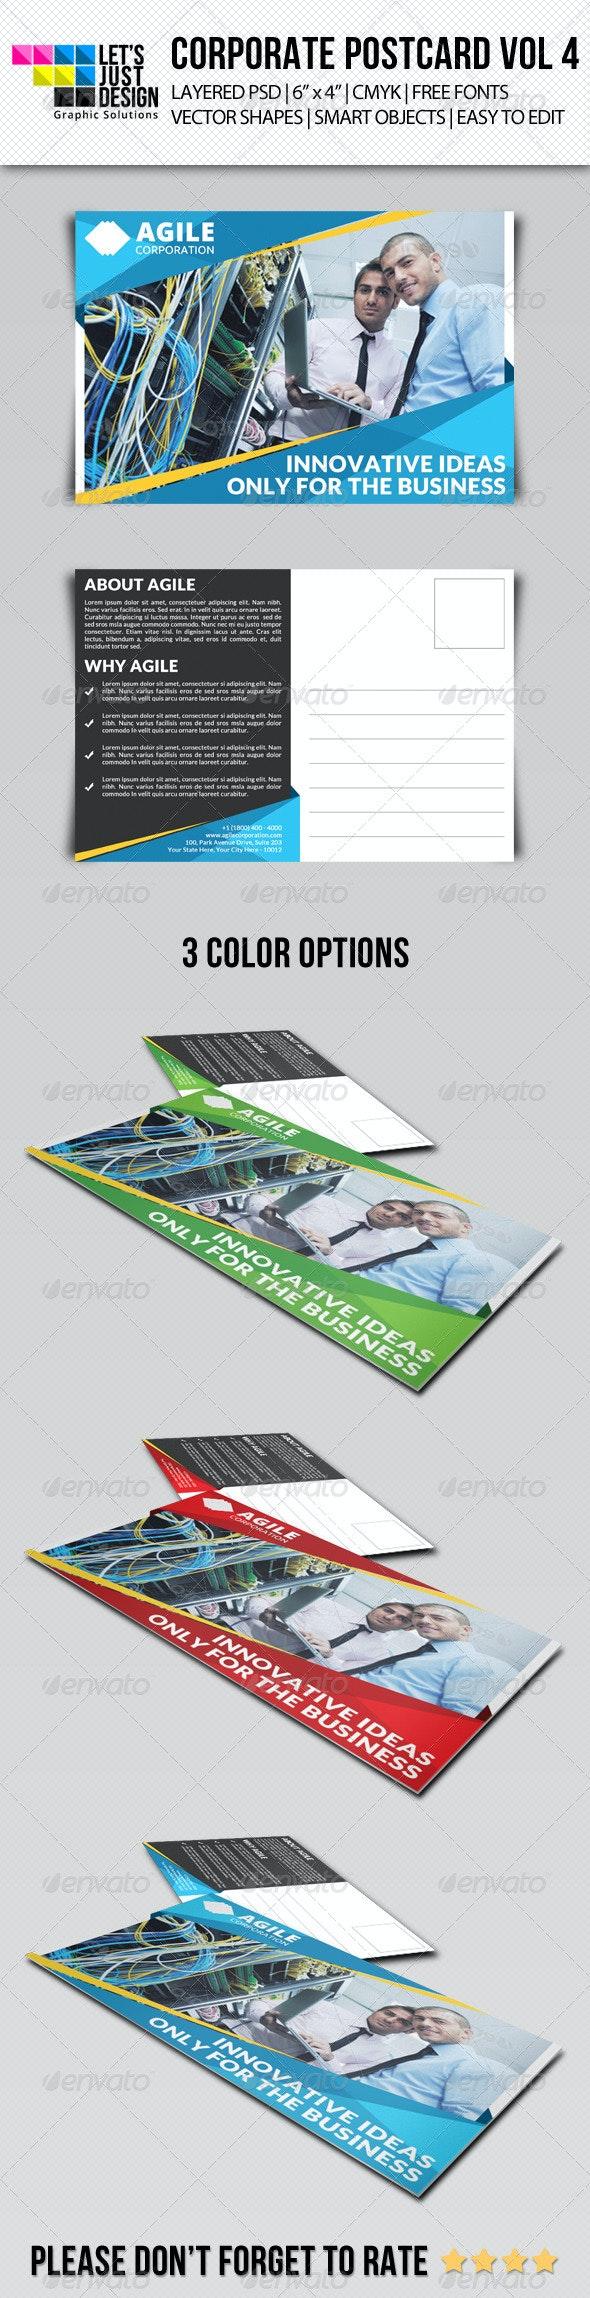 Corporate Postcard Template Vol 4 - Cards & Invites Print Templates